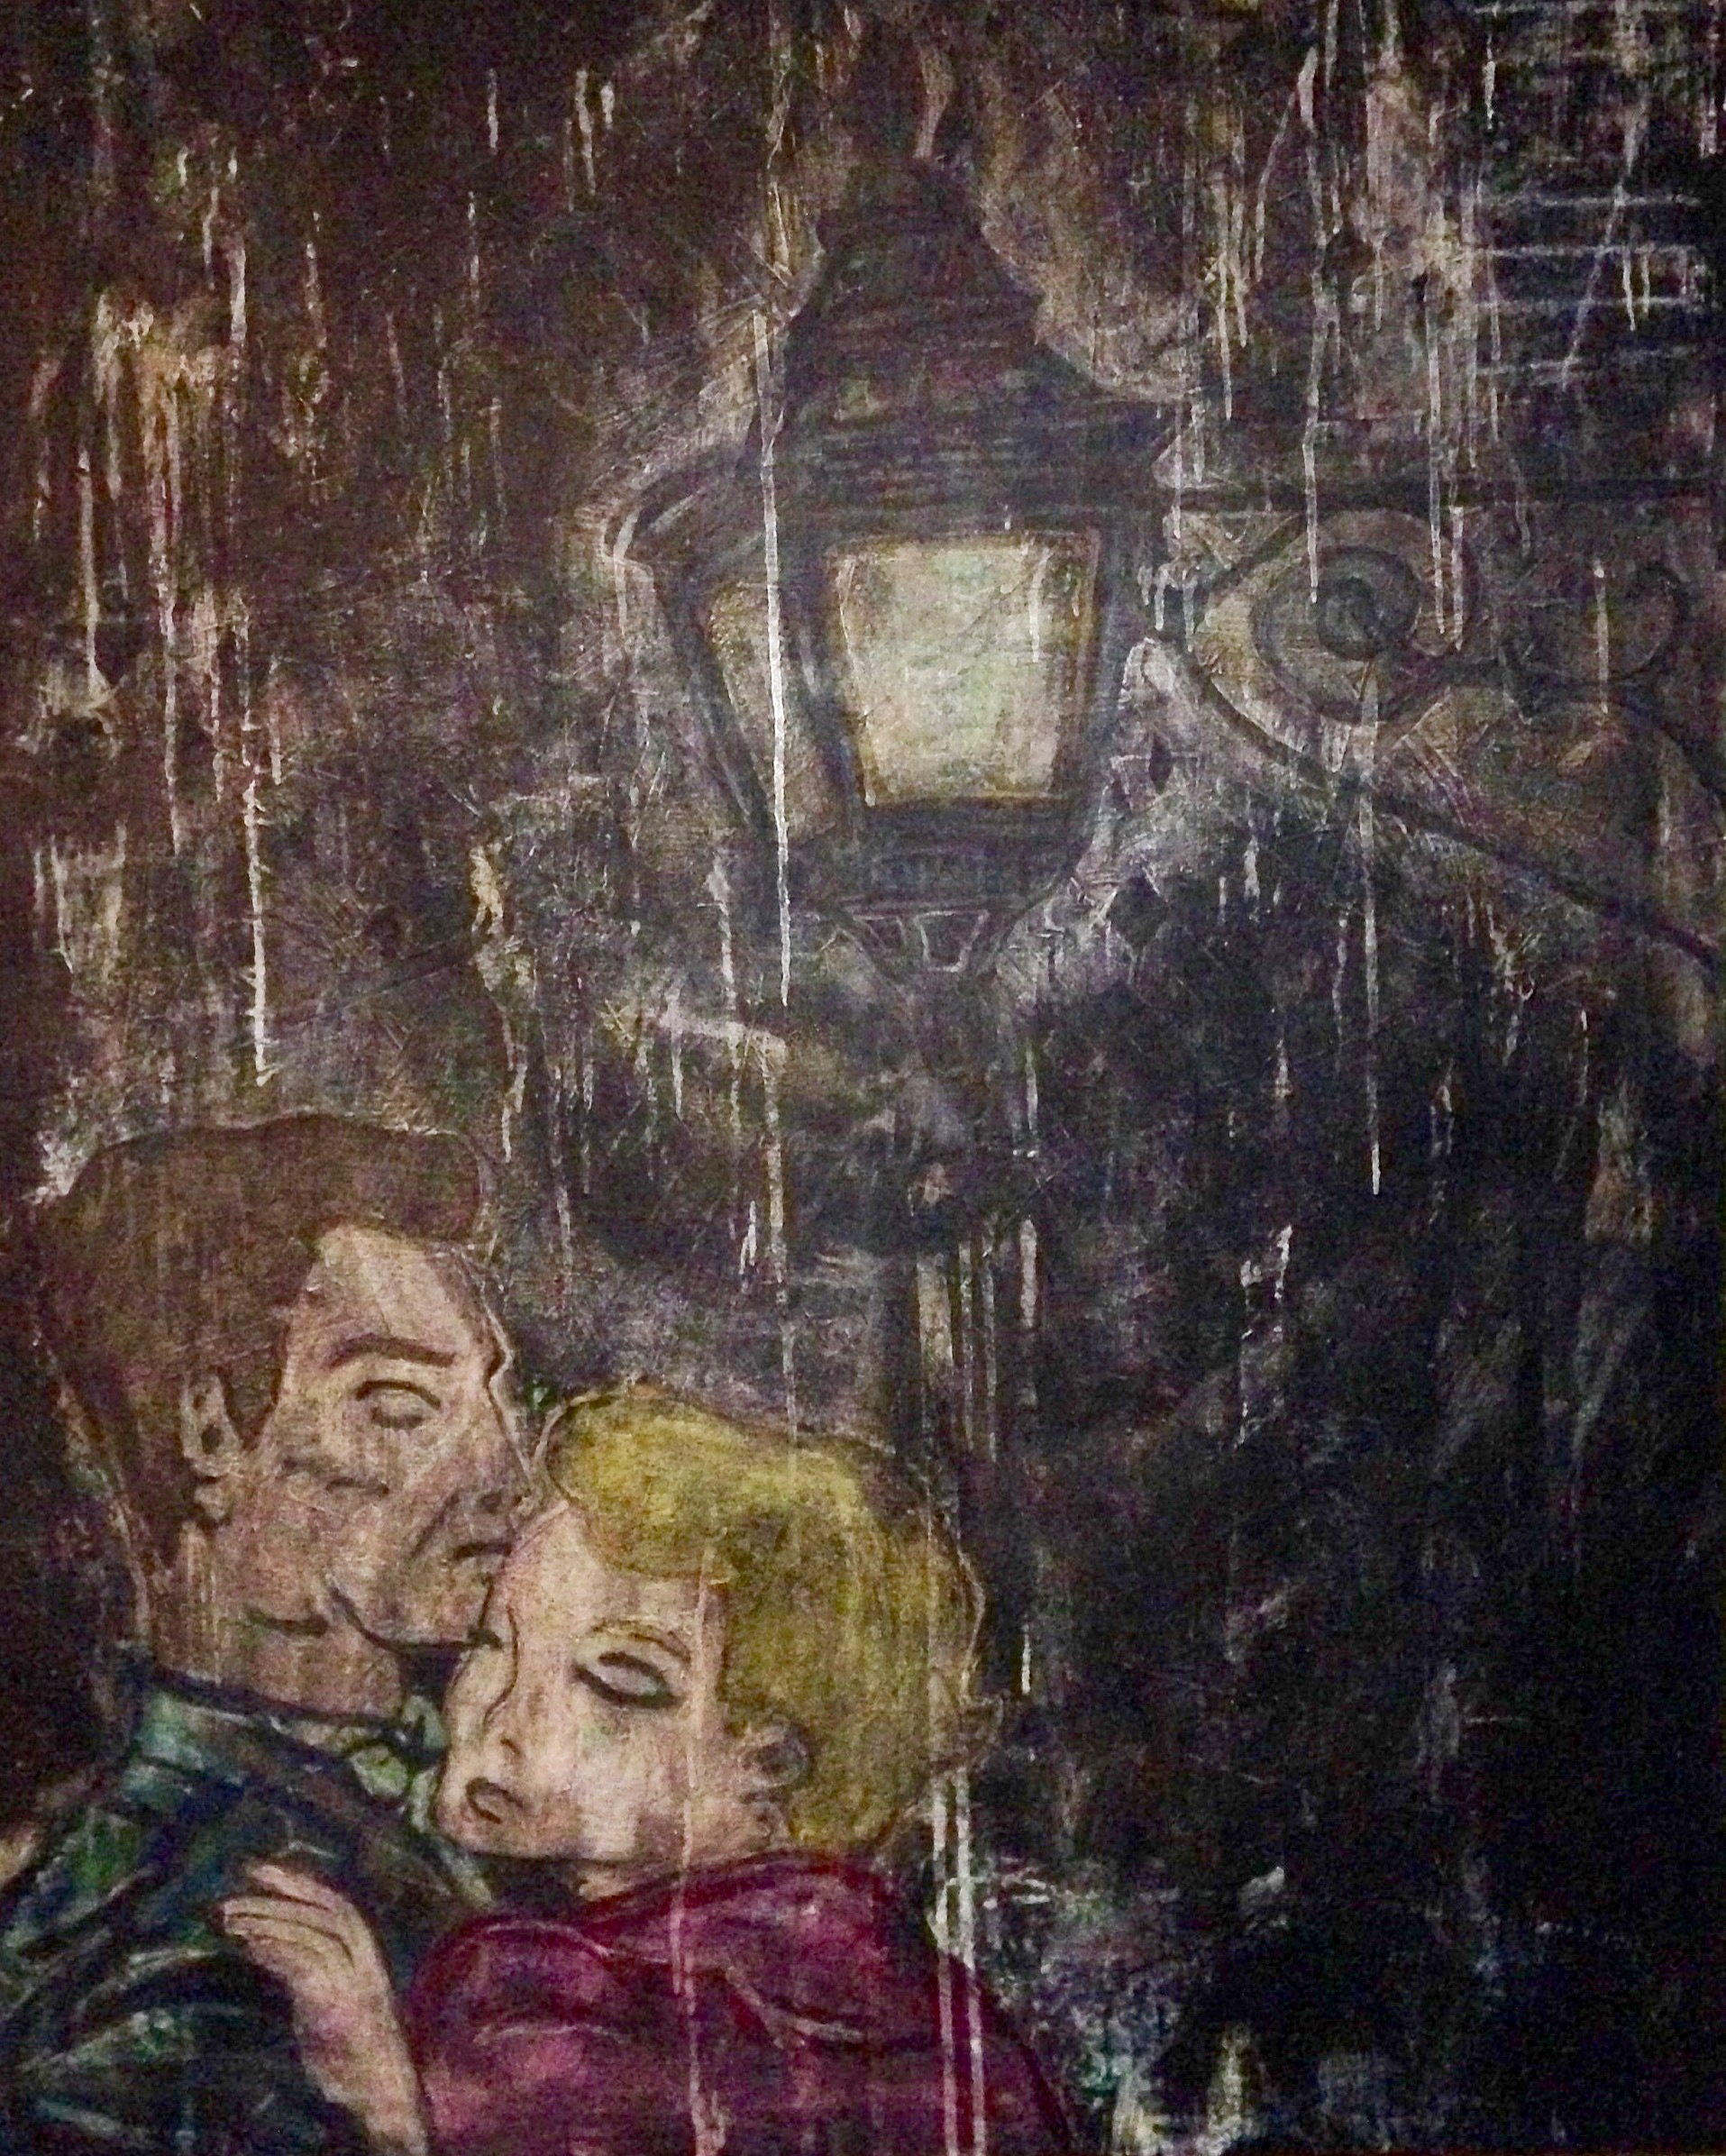 Transient Love, 2015